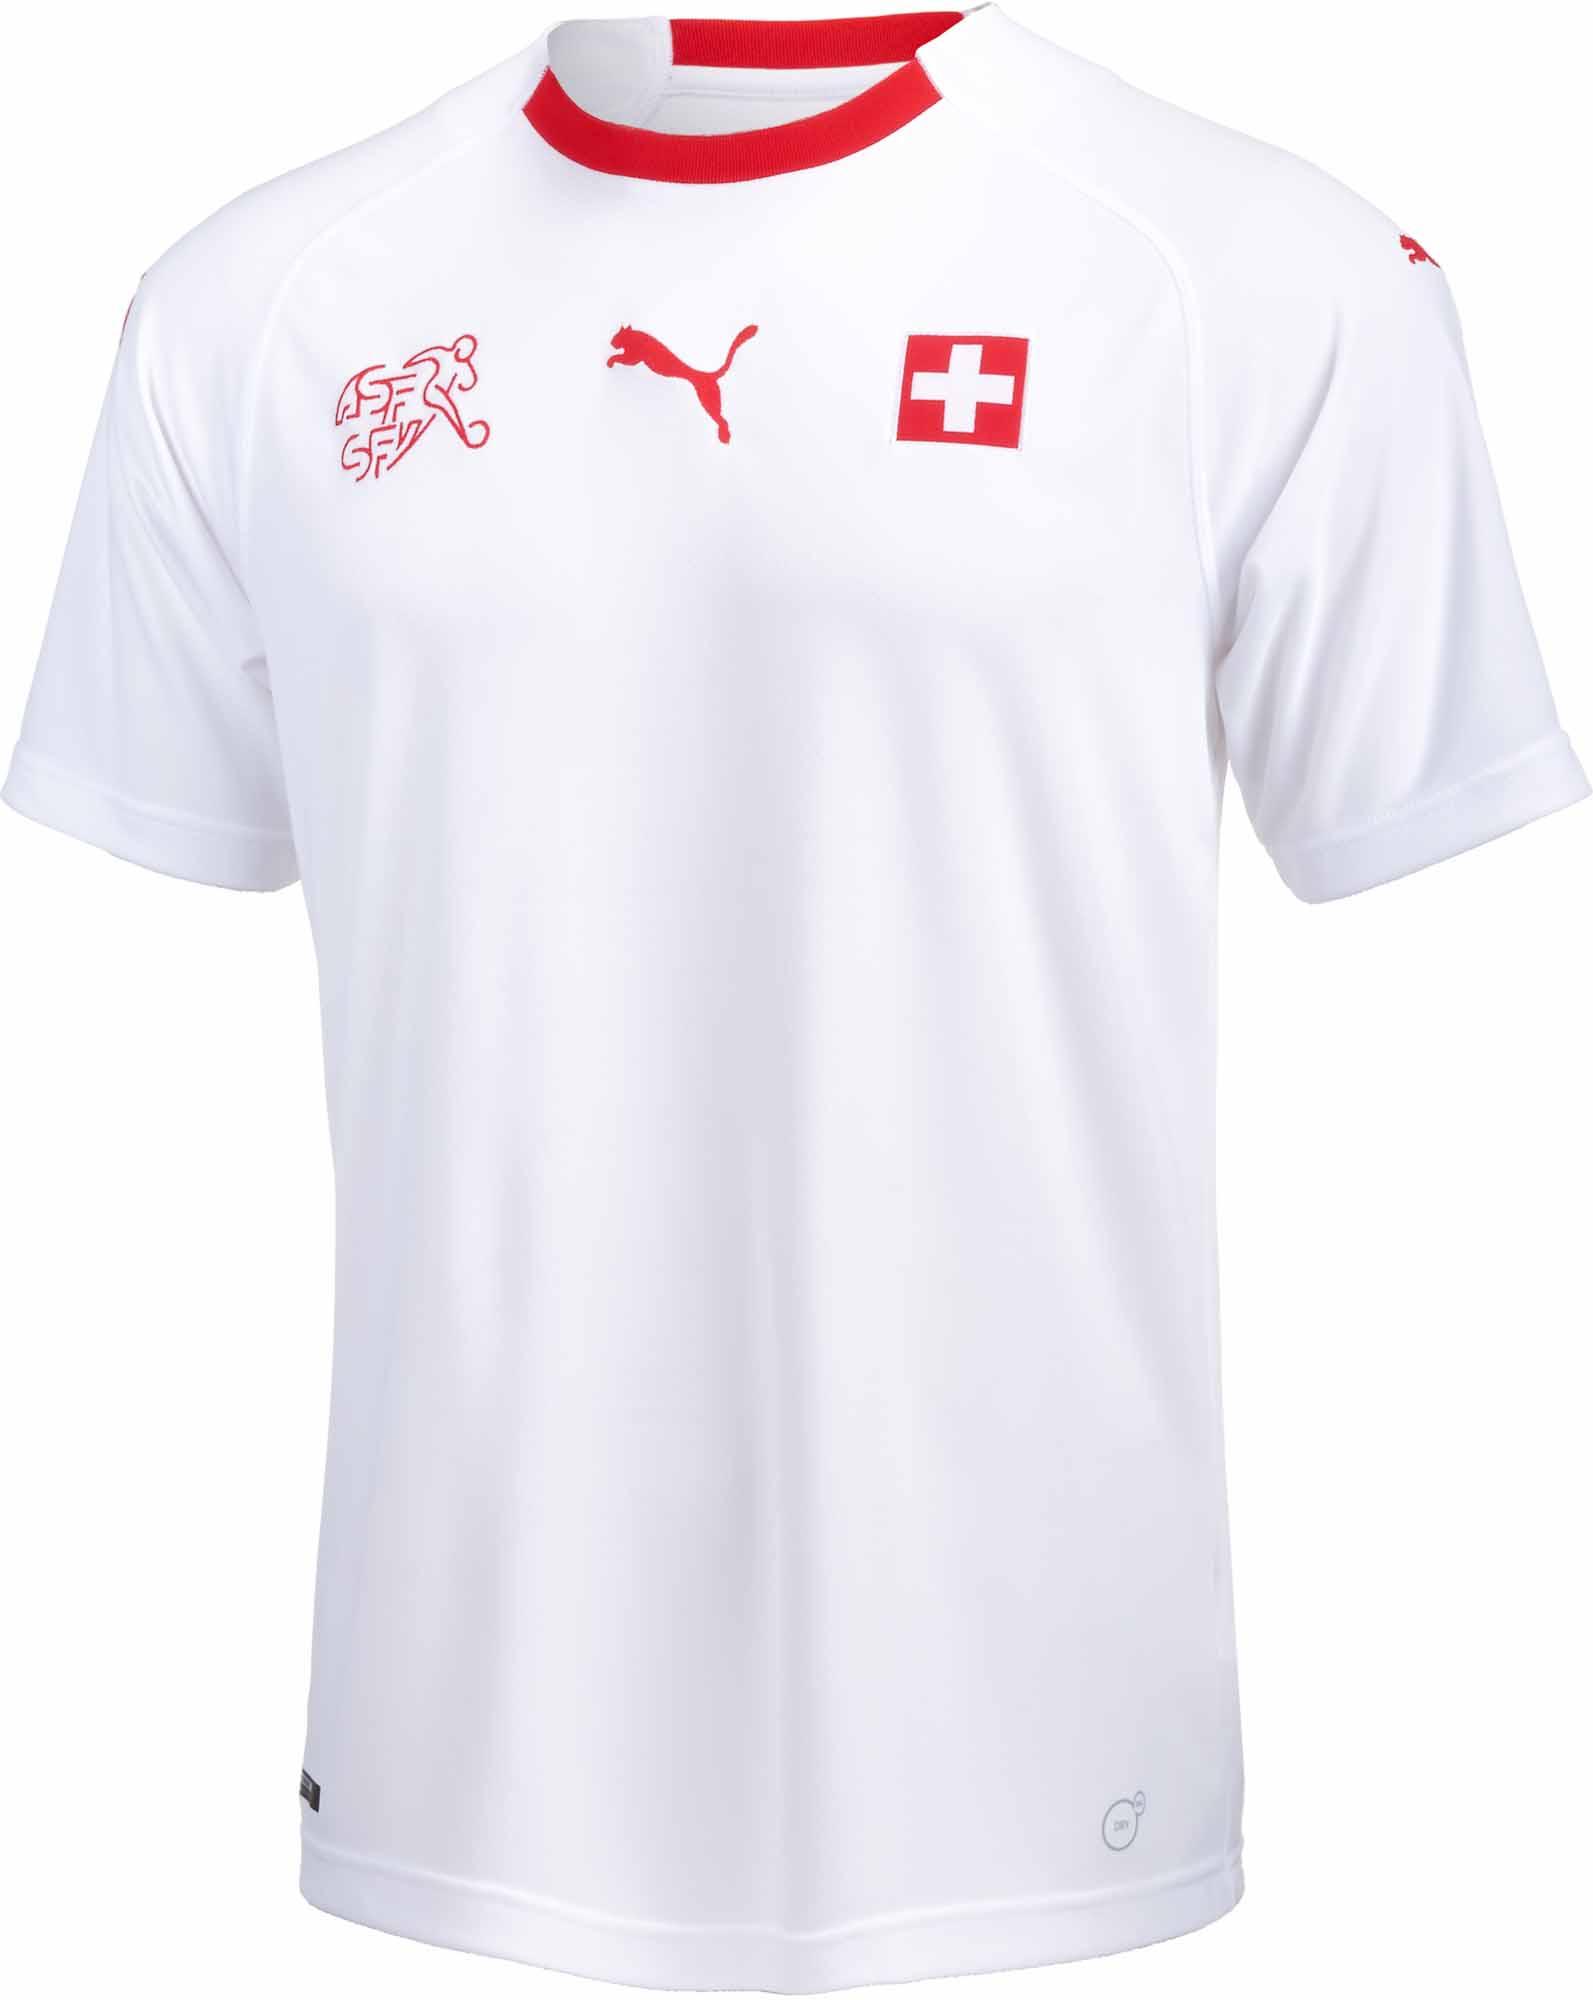 90979d62ec3 Puma Switzerland Away Jersey 2017-18 - SoccerPro